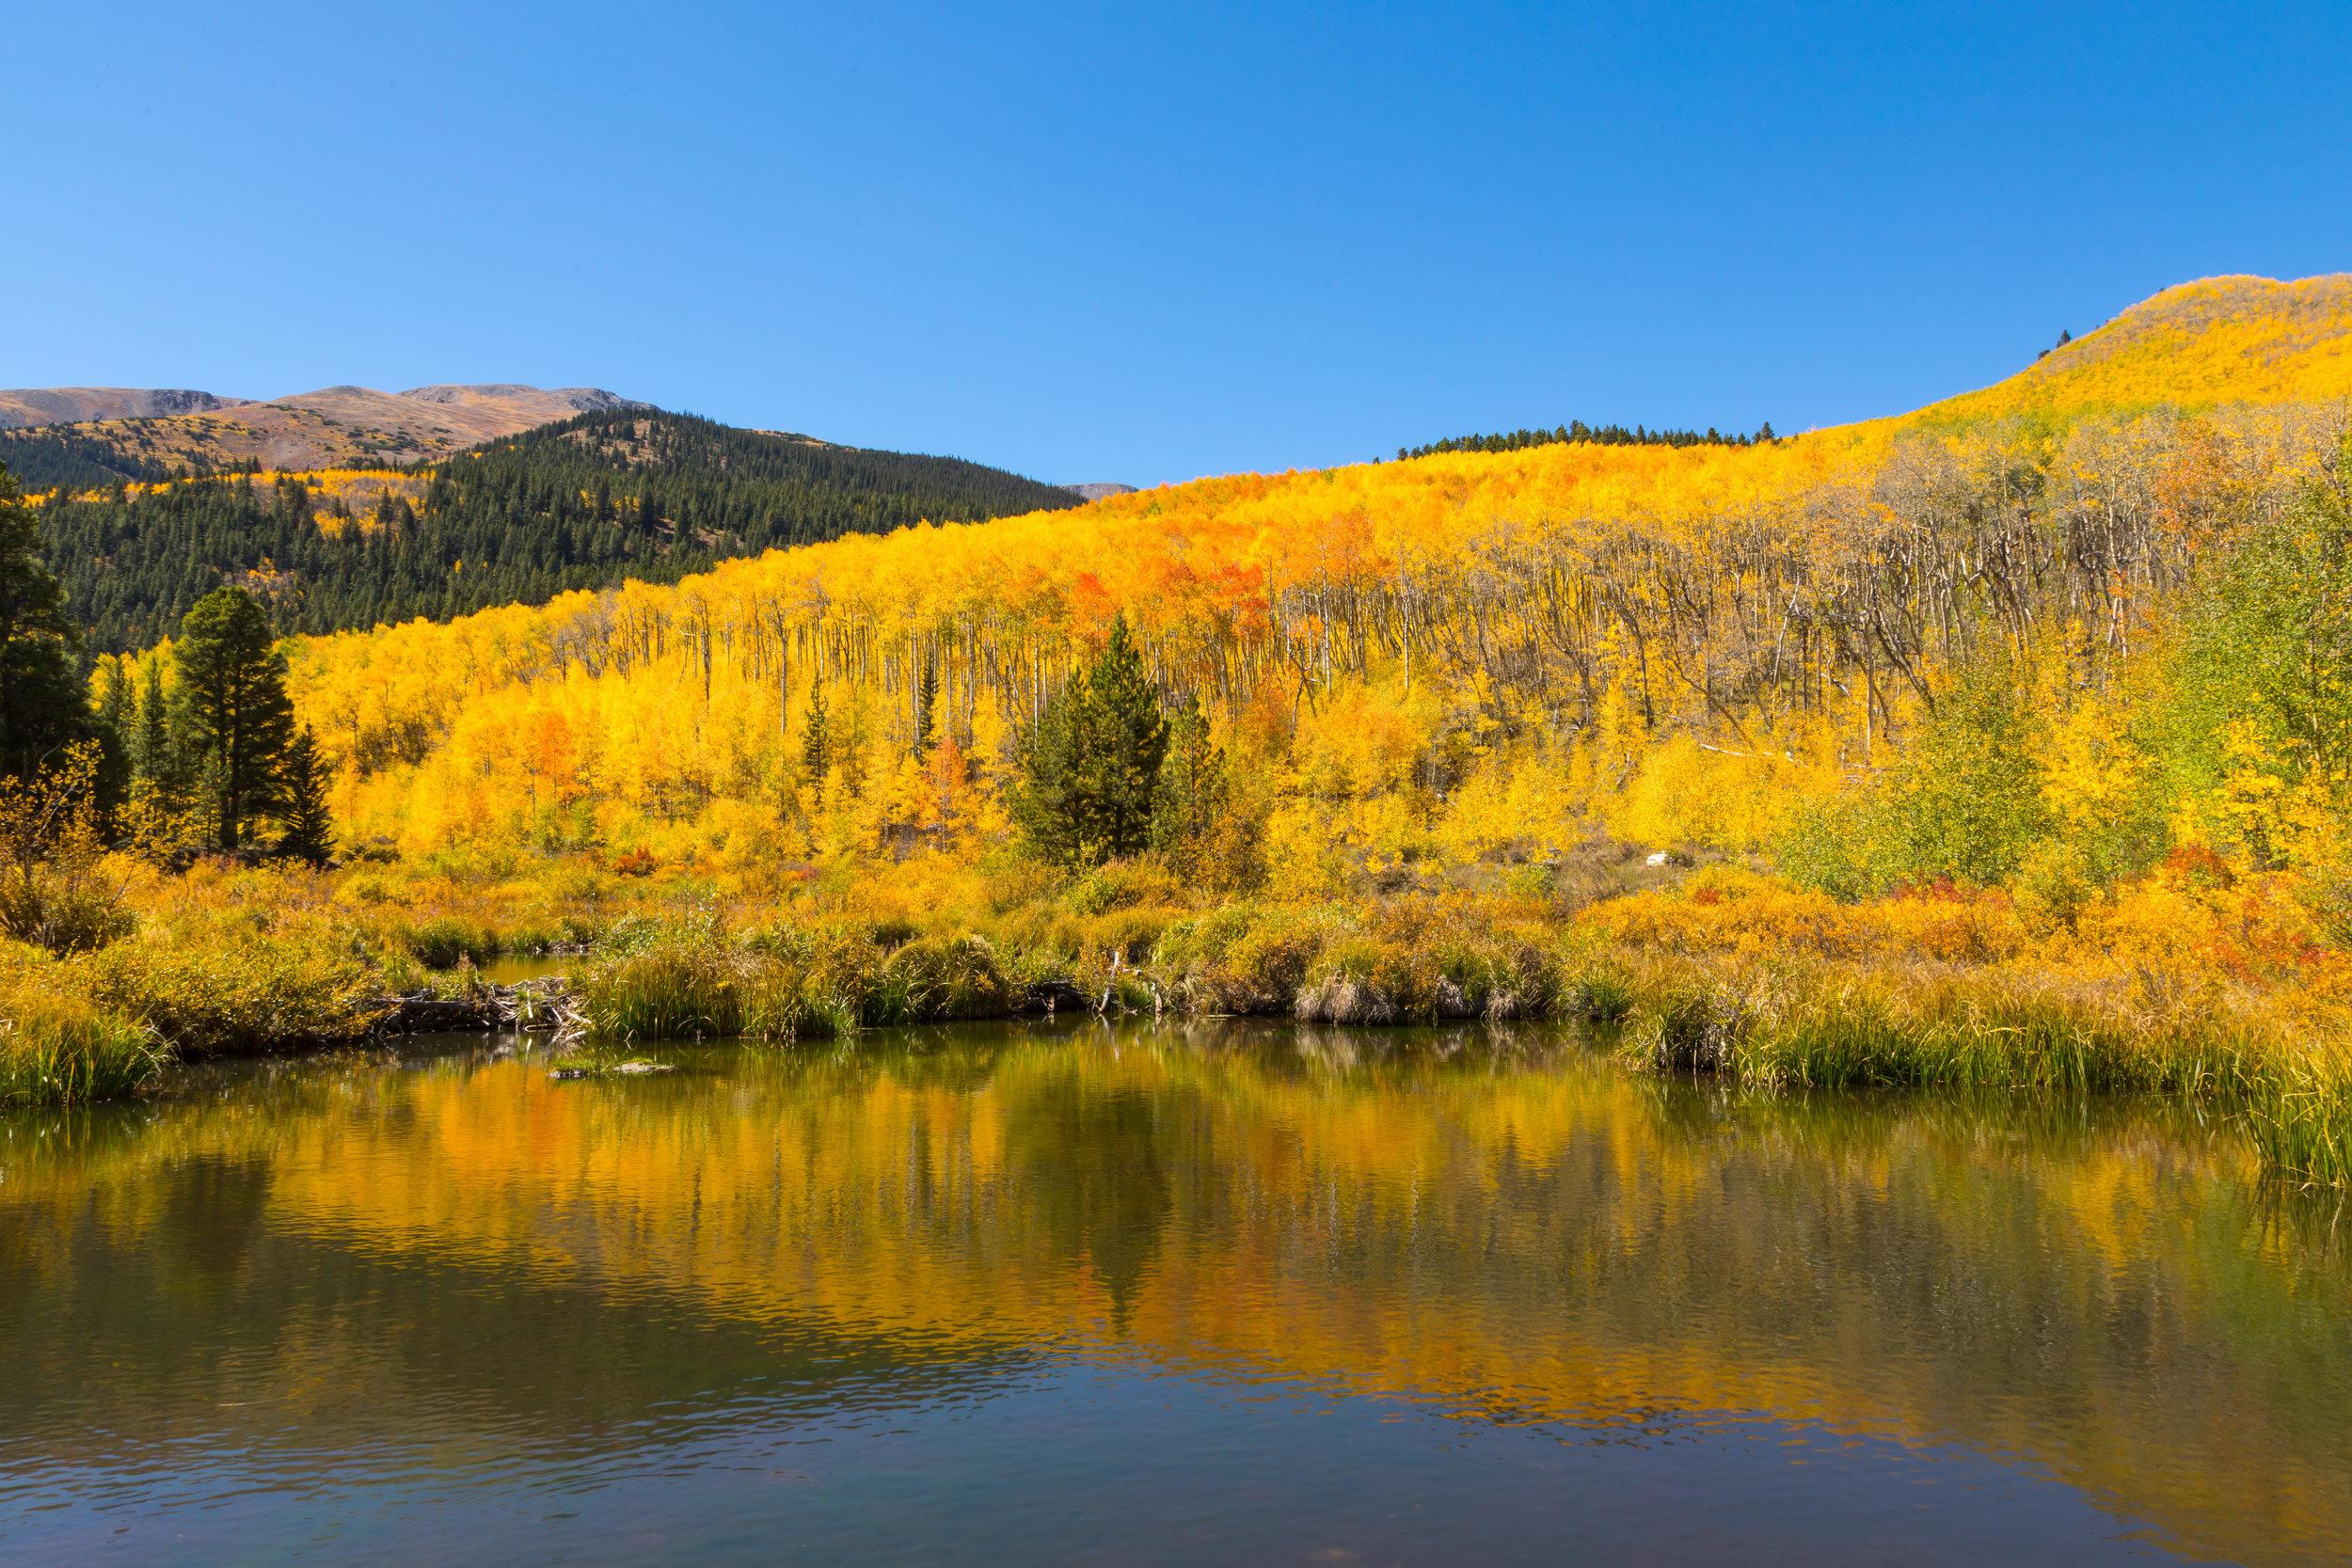 Twin Lakes, Image # 0786